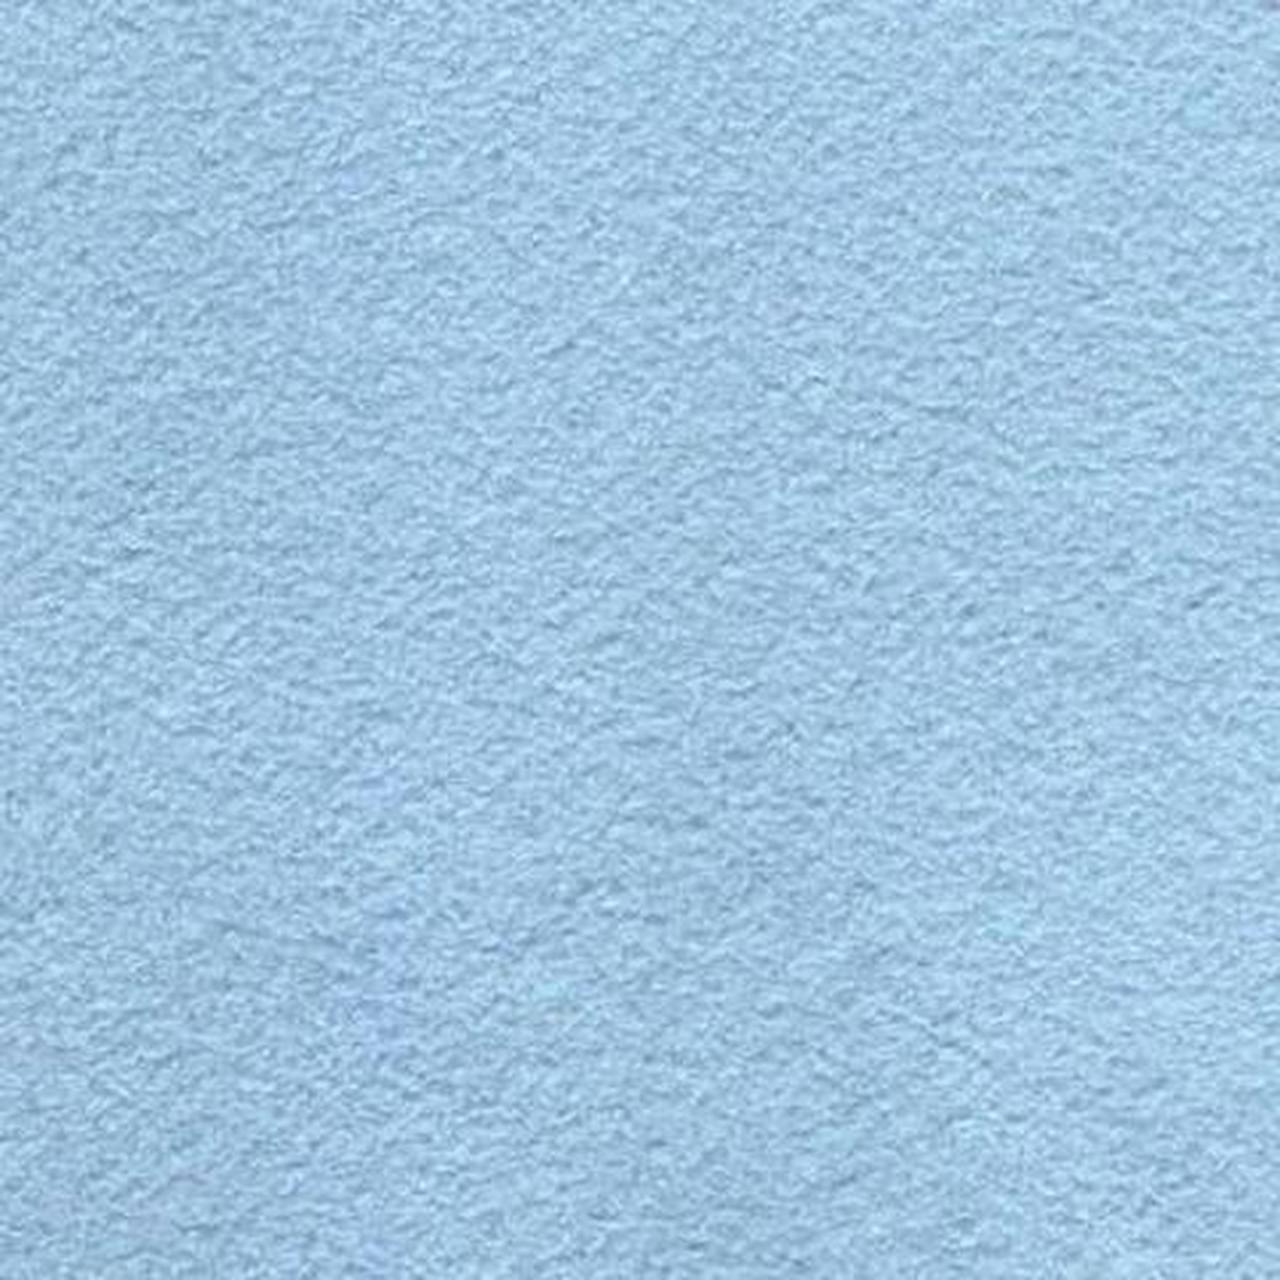 Moda Fireside 60 Polyester Wide Back - Baby Blue (Min order of 1m)